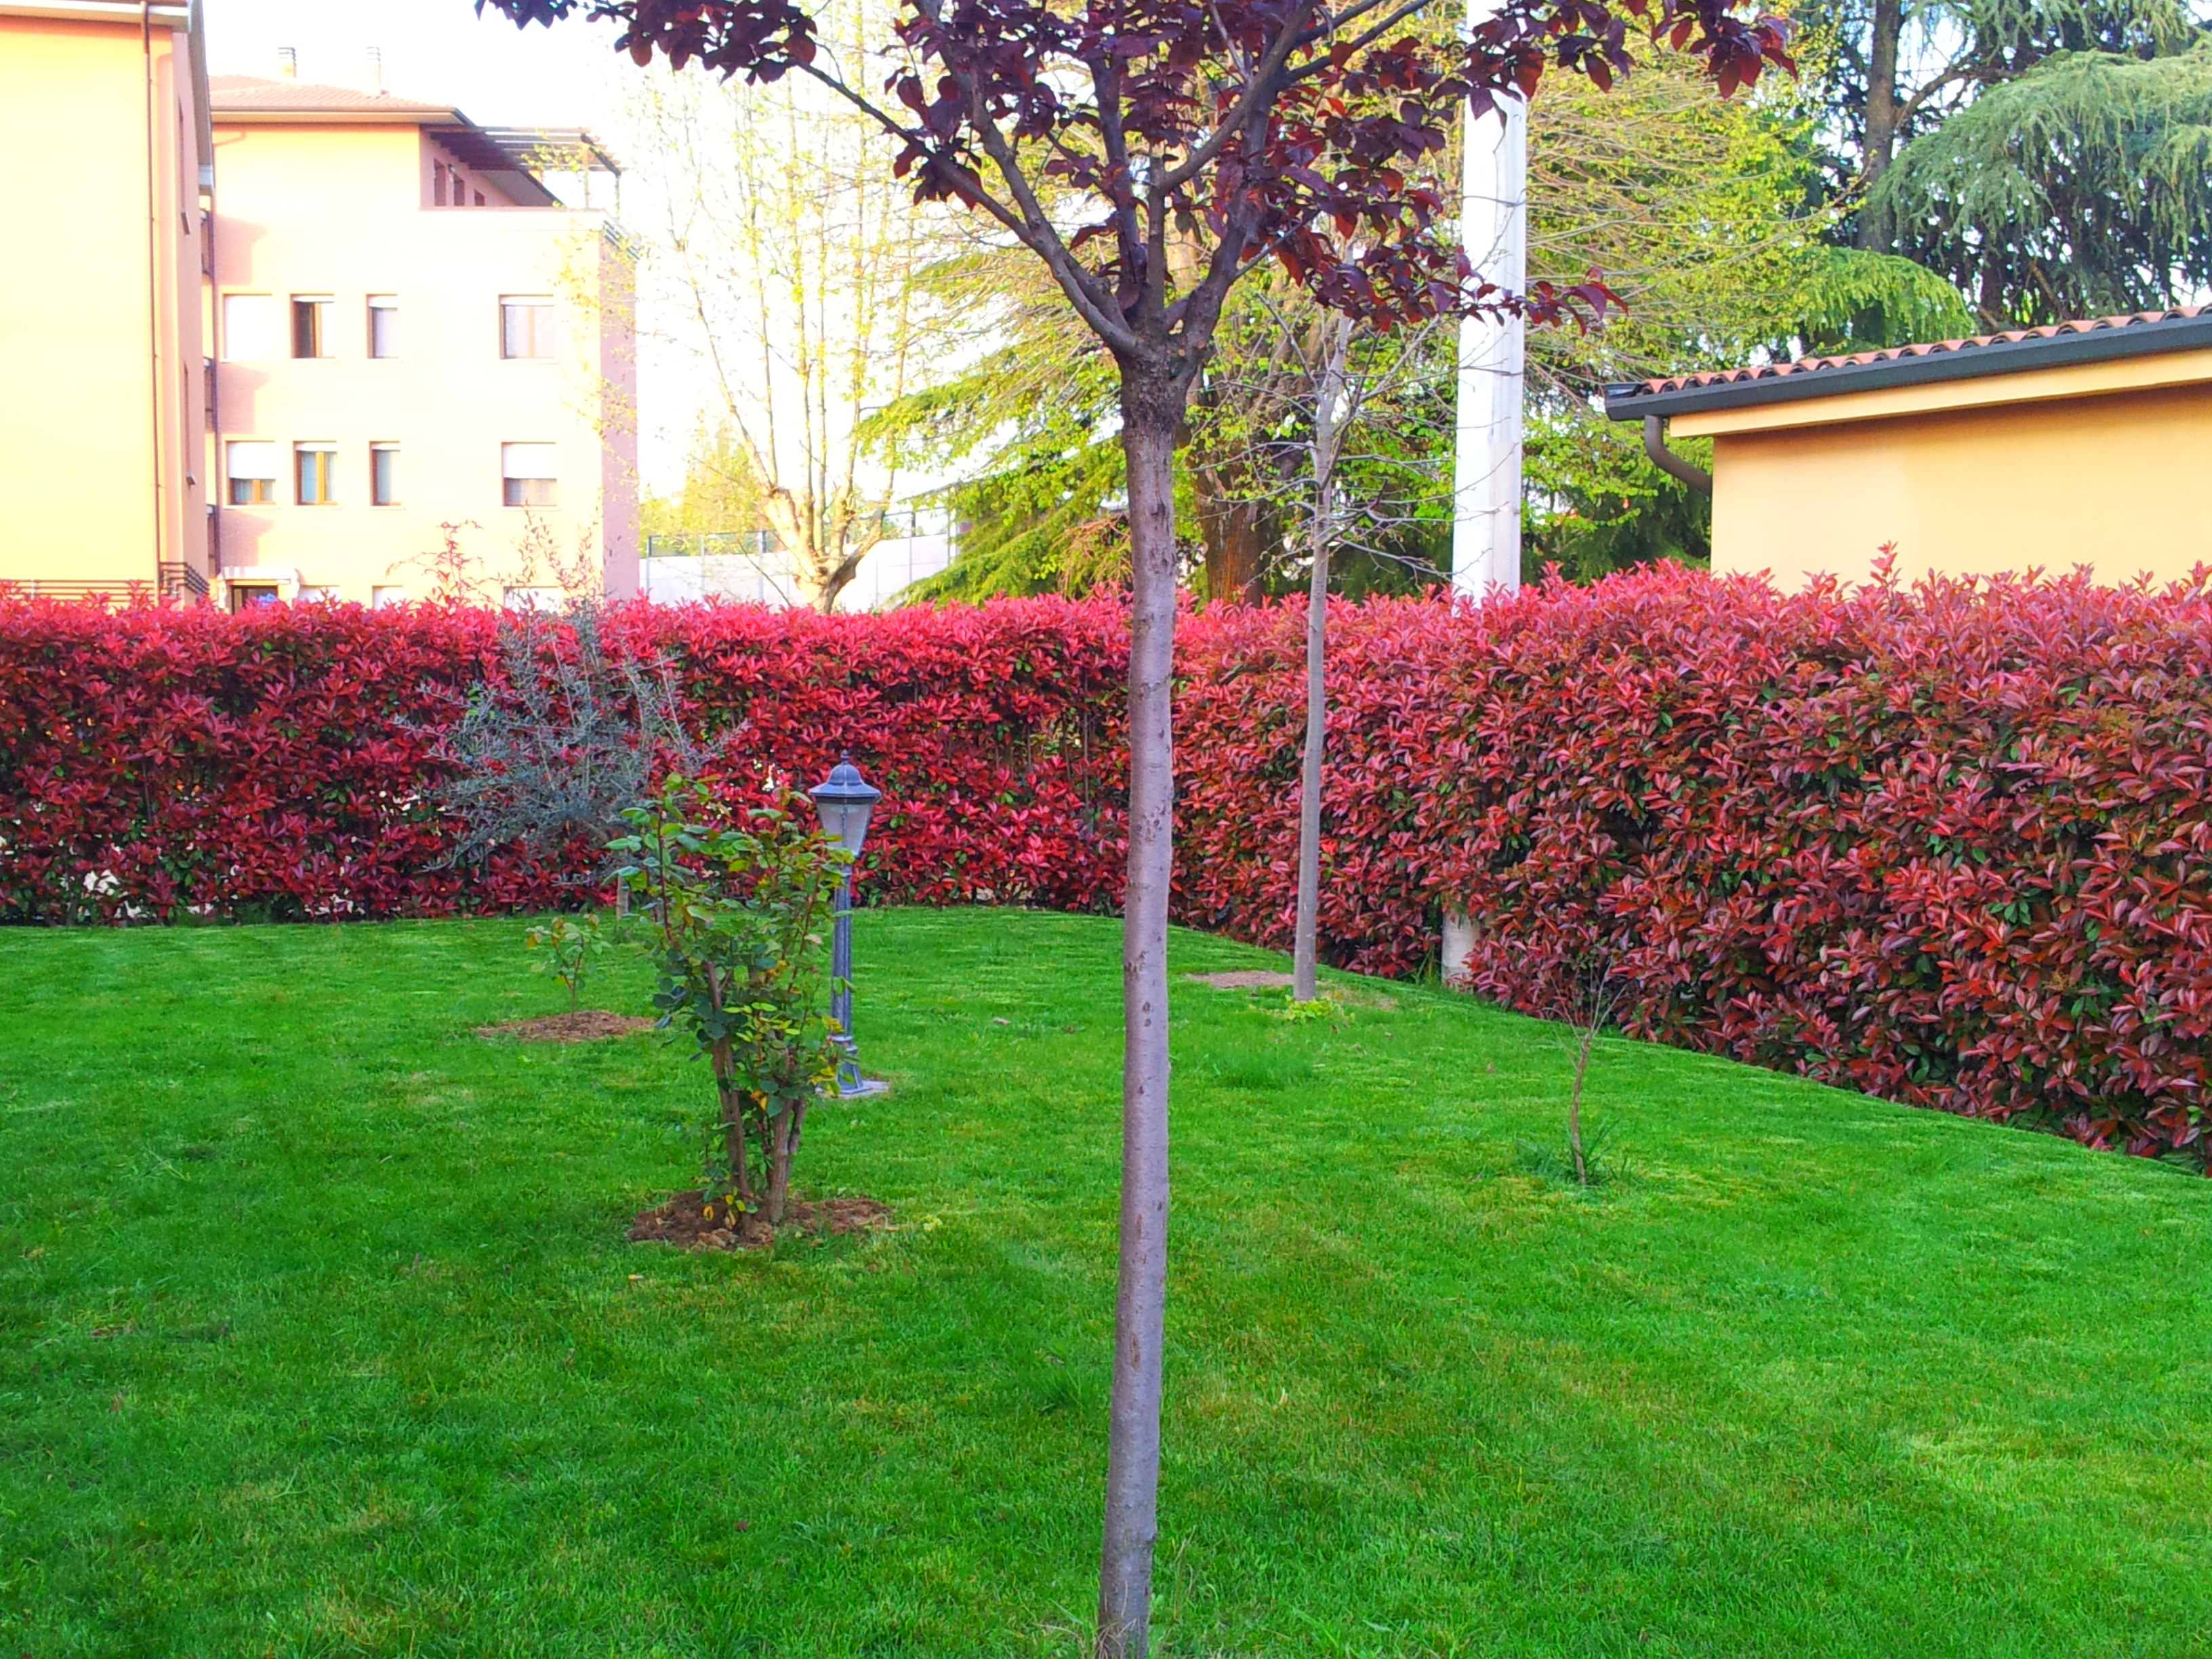 Photinia pianta per siepi da giardino - Siepi da giardino fiorite ...